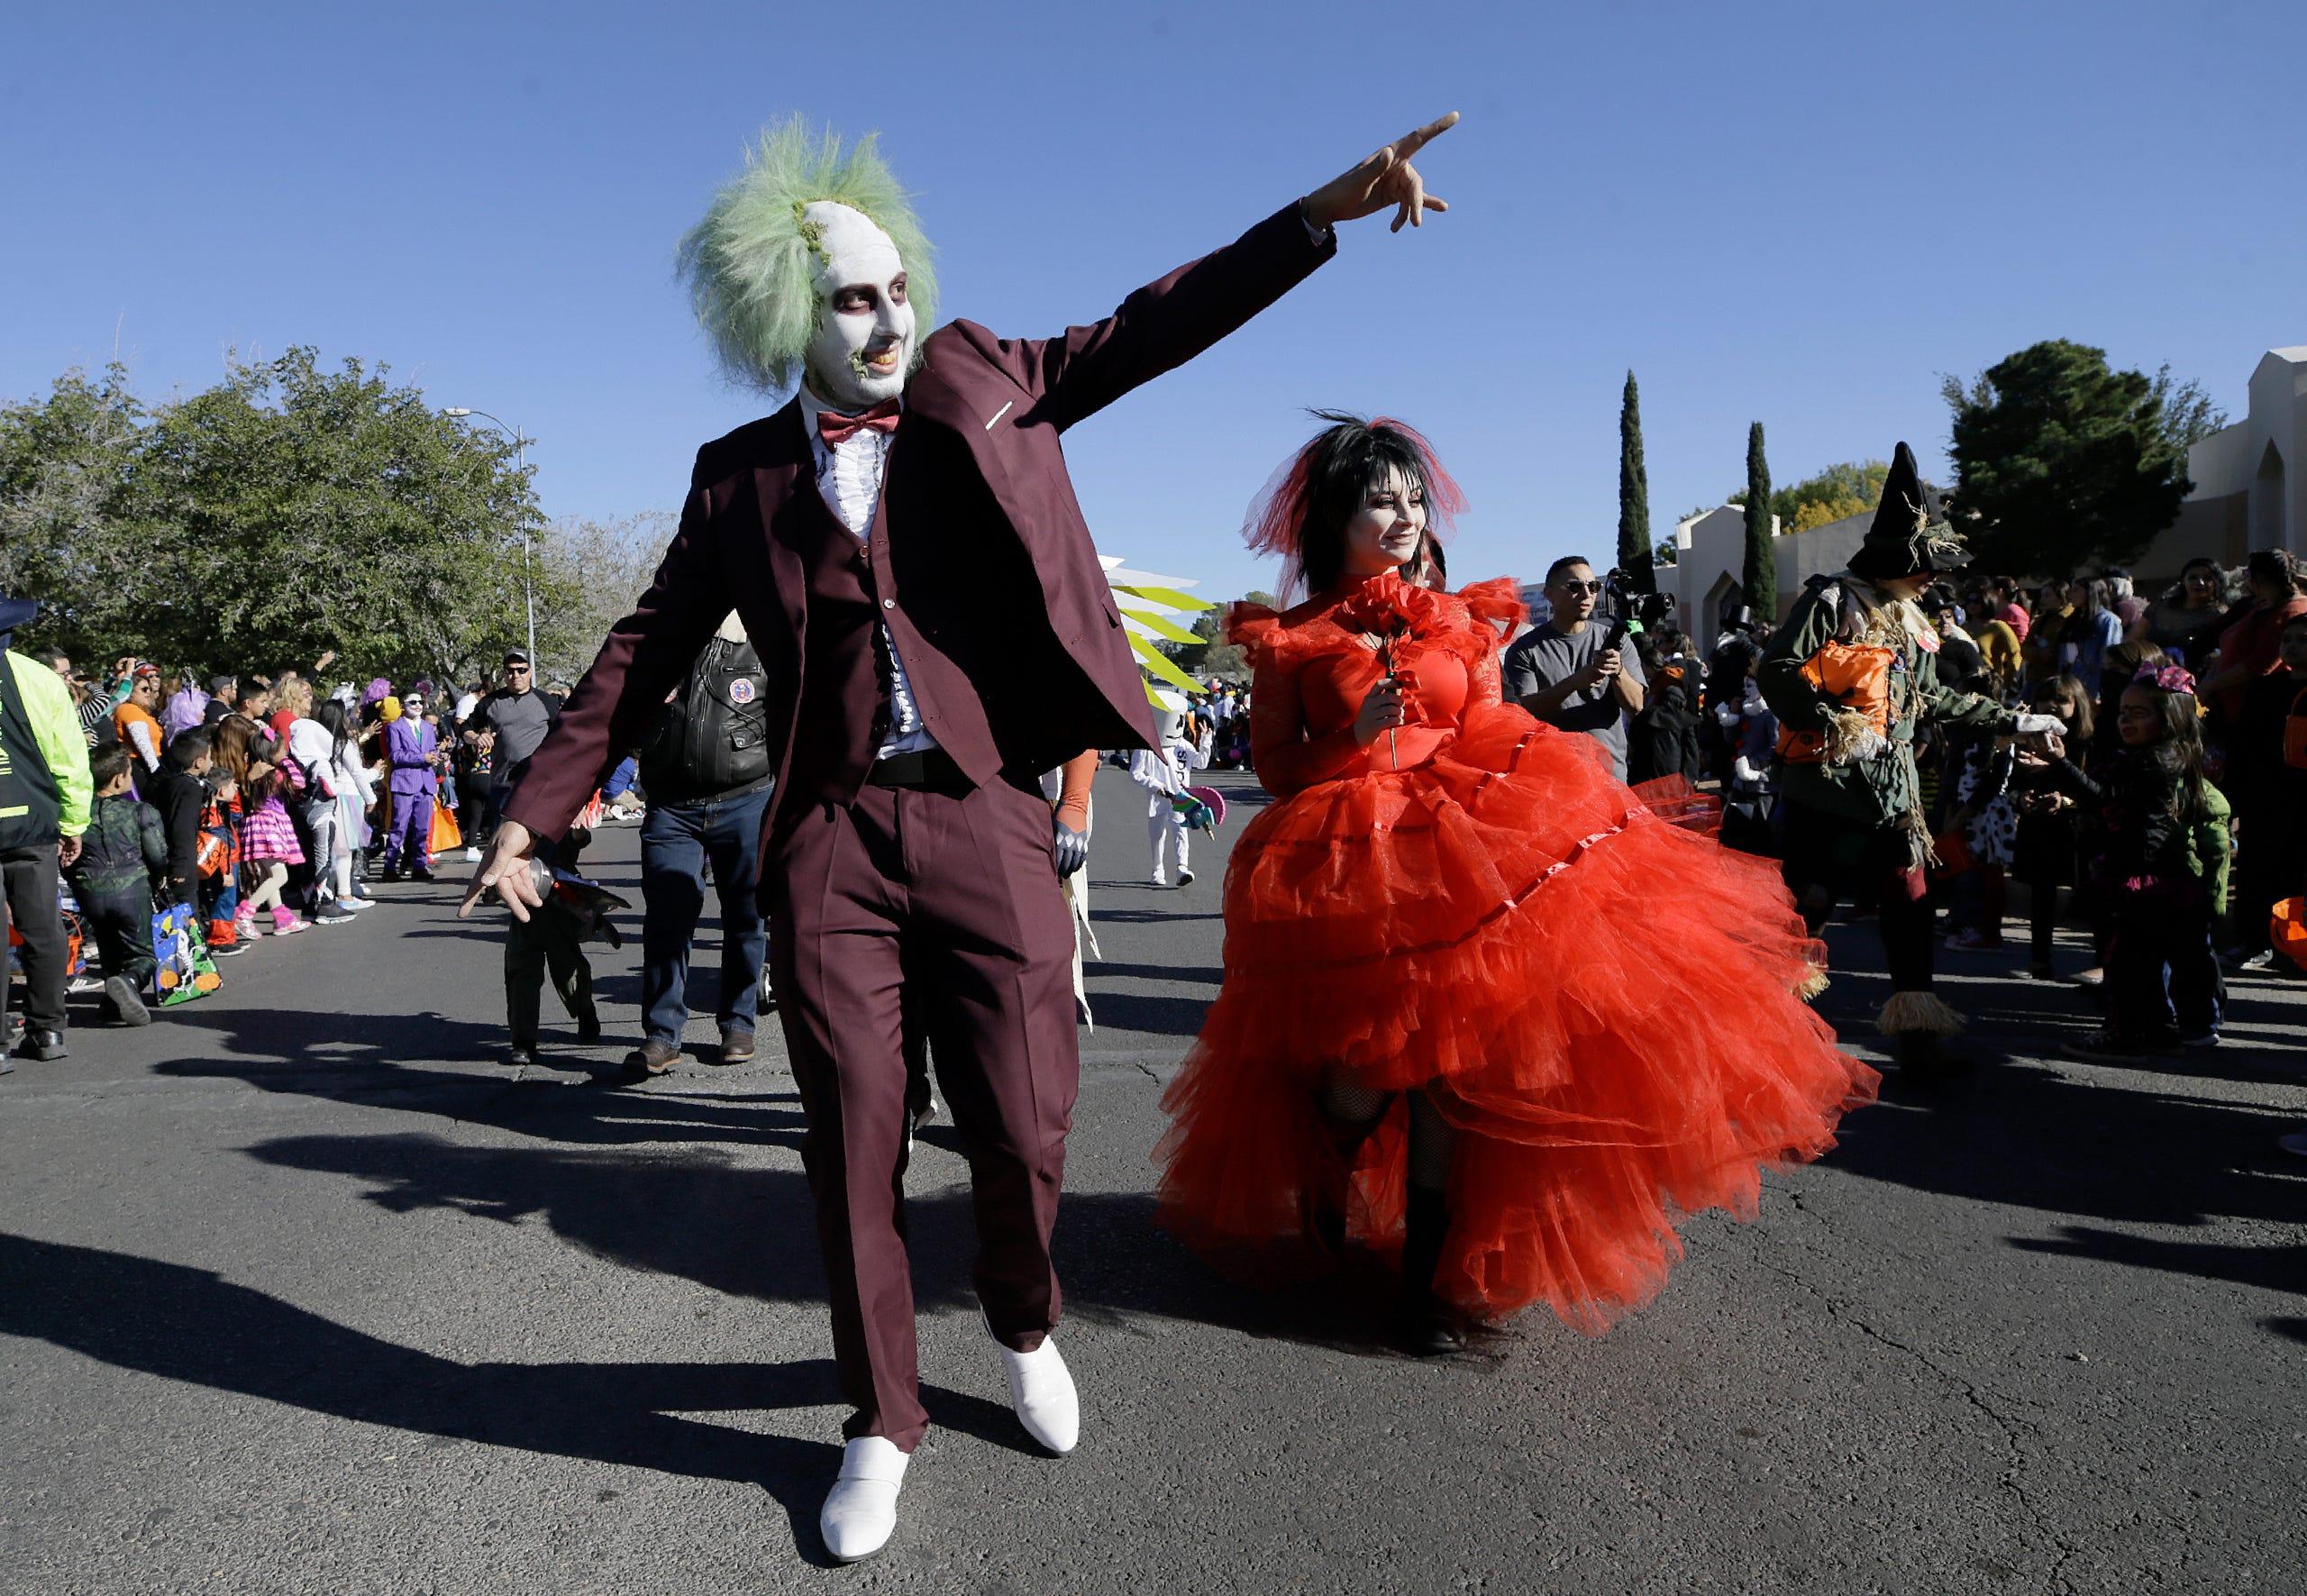 Klaq Halloween Parade 2020 KLAQ Halloween Parade 2019 Kicks Off Costumed Fun